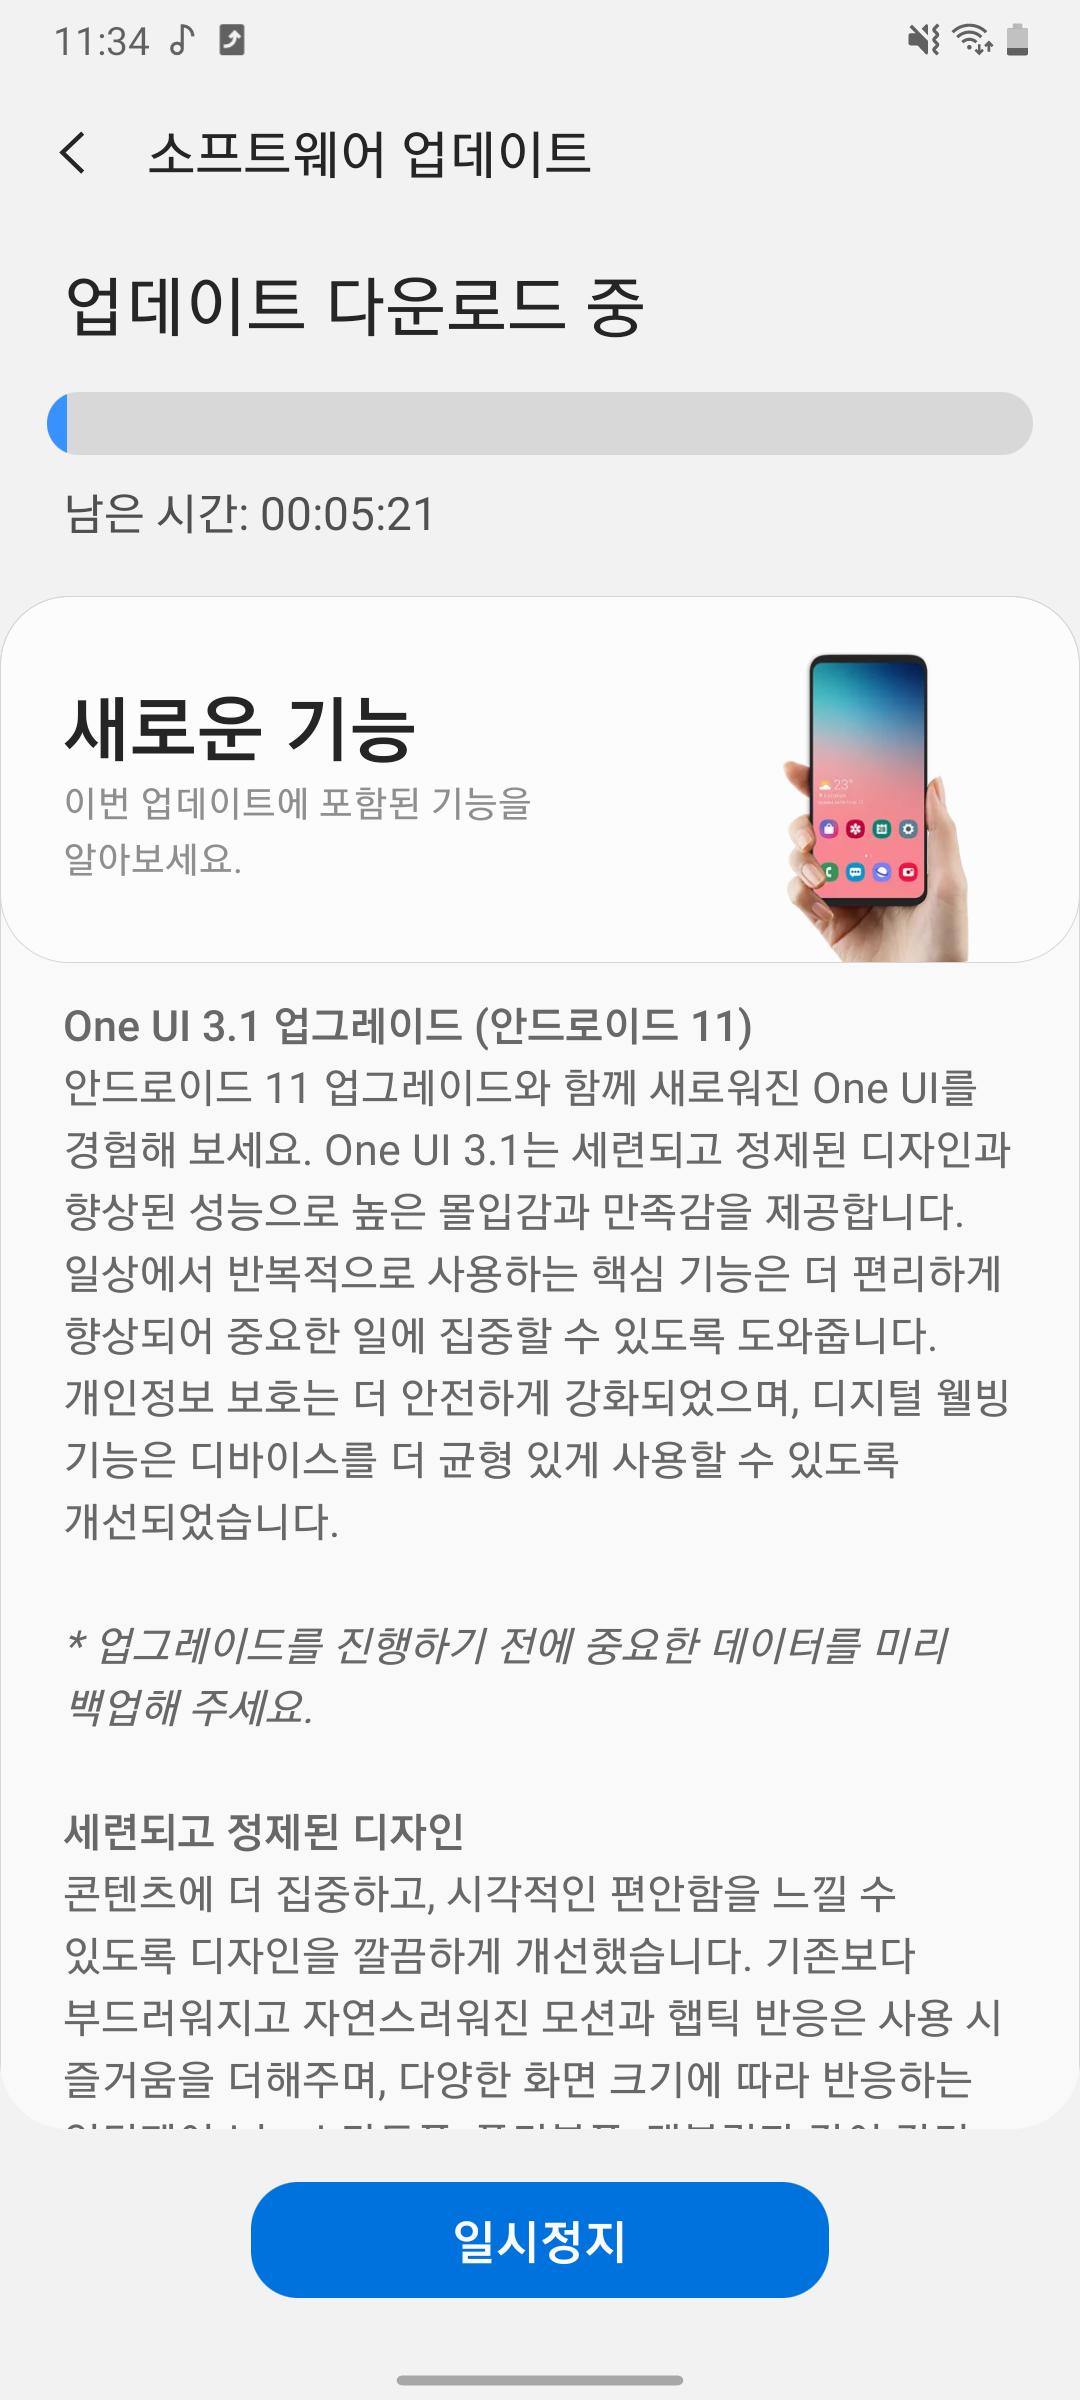 samsung galaxy a31 one ui 3.1 android 11 aggiornamento